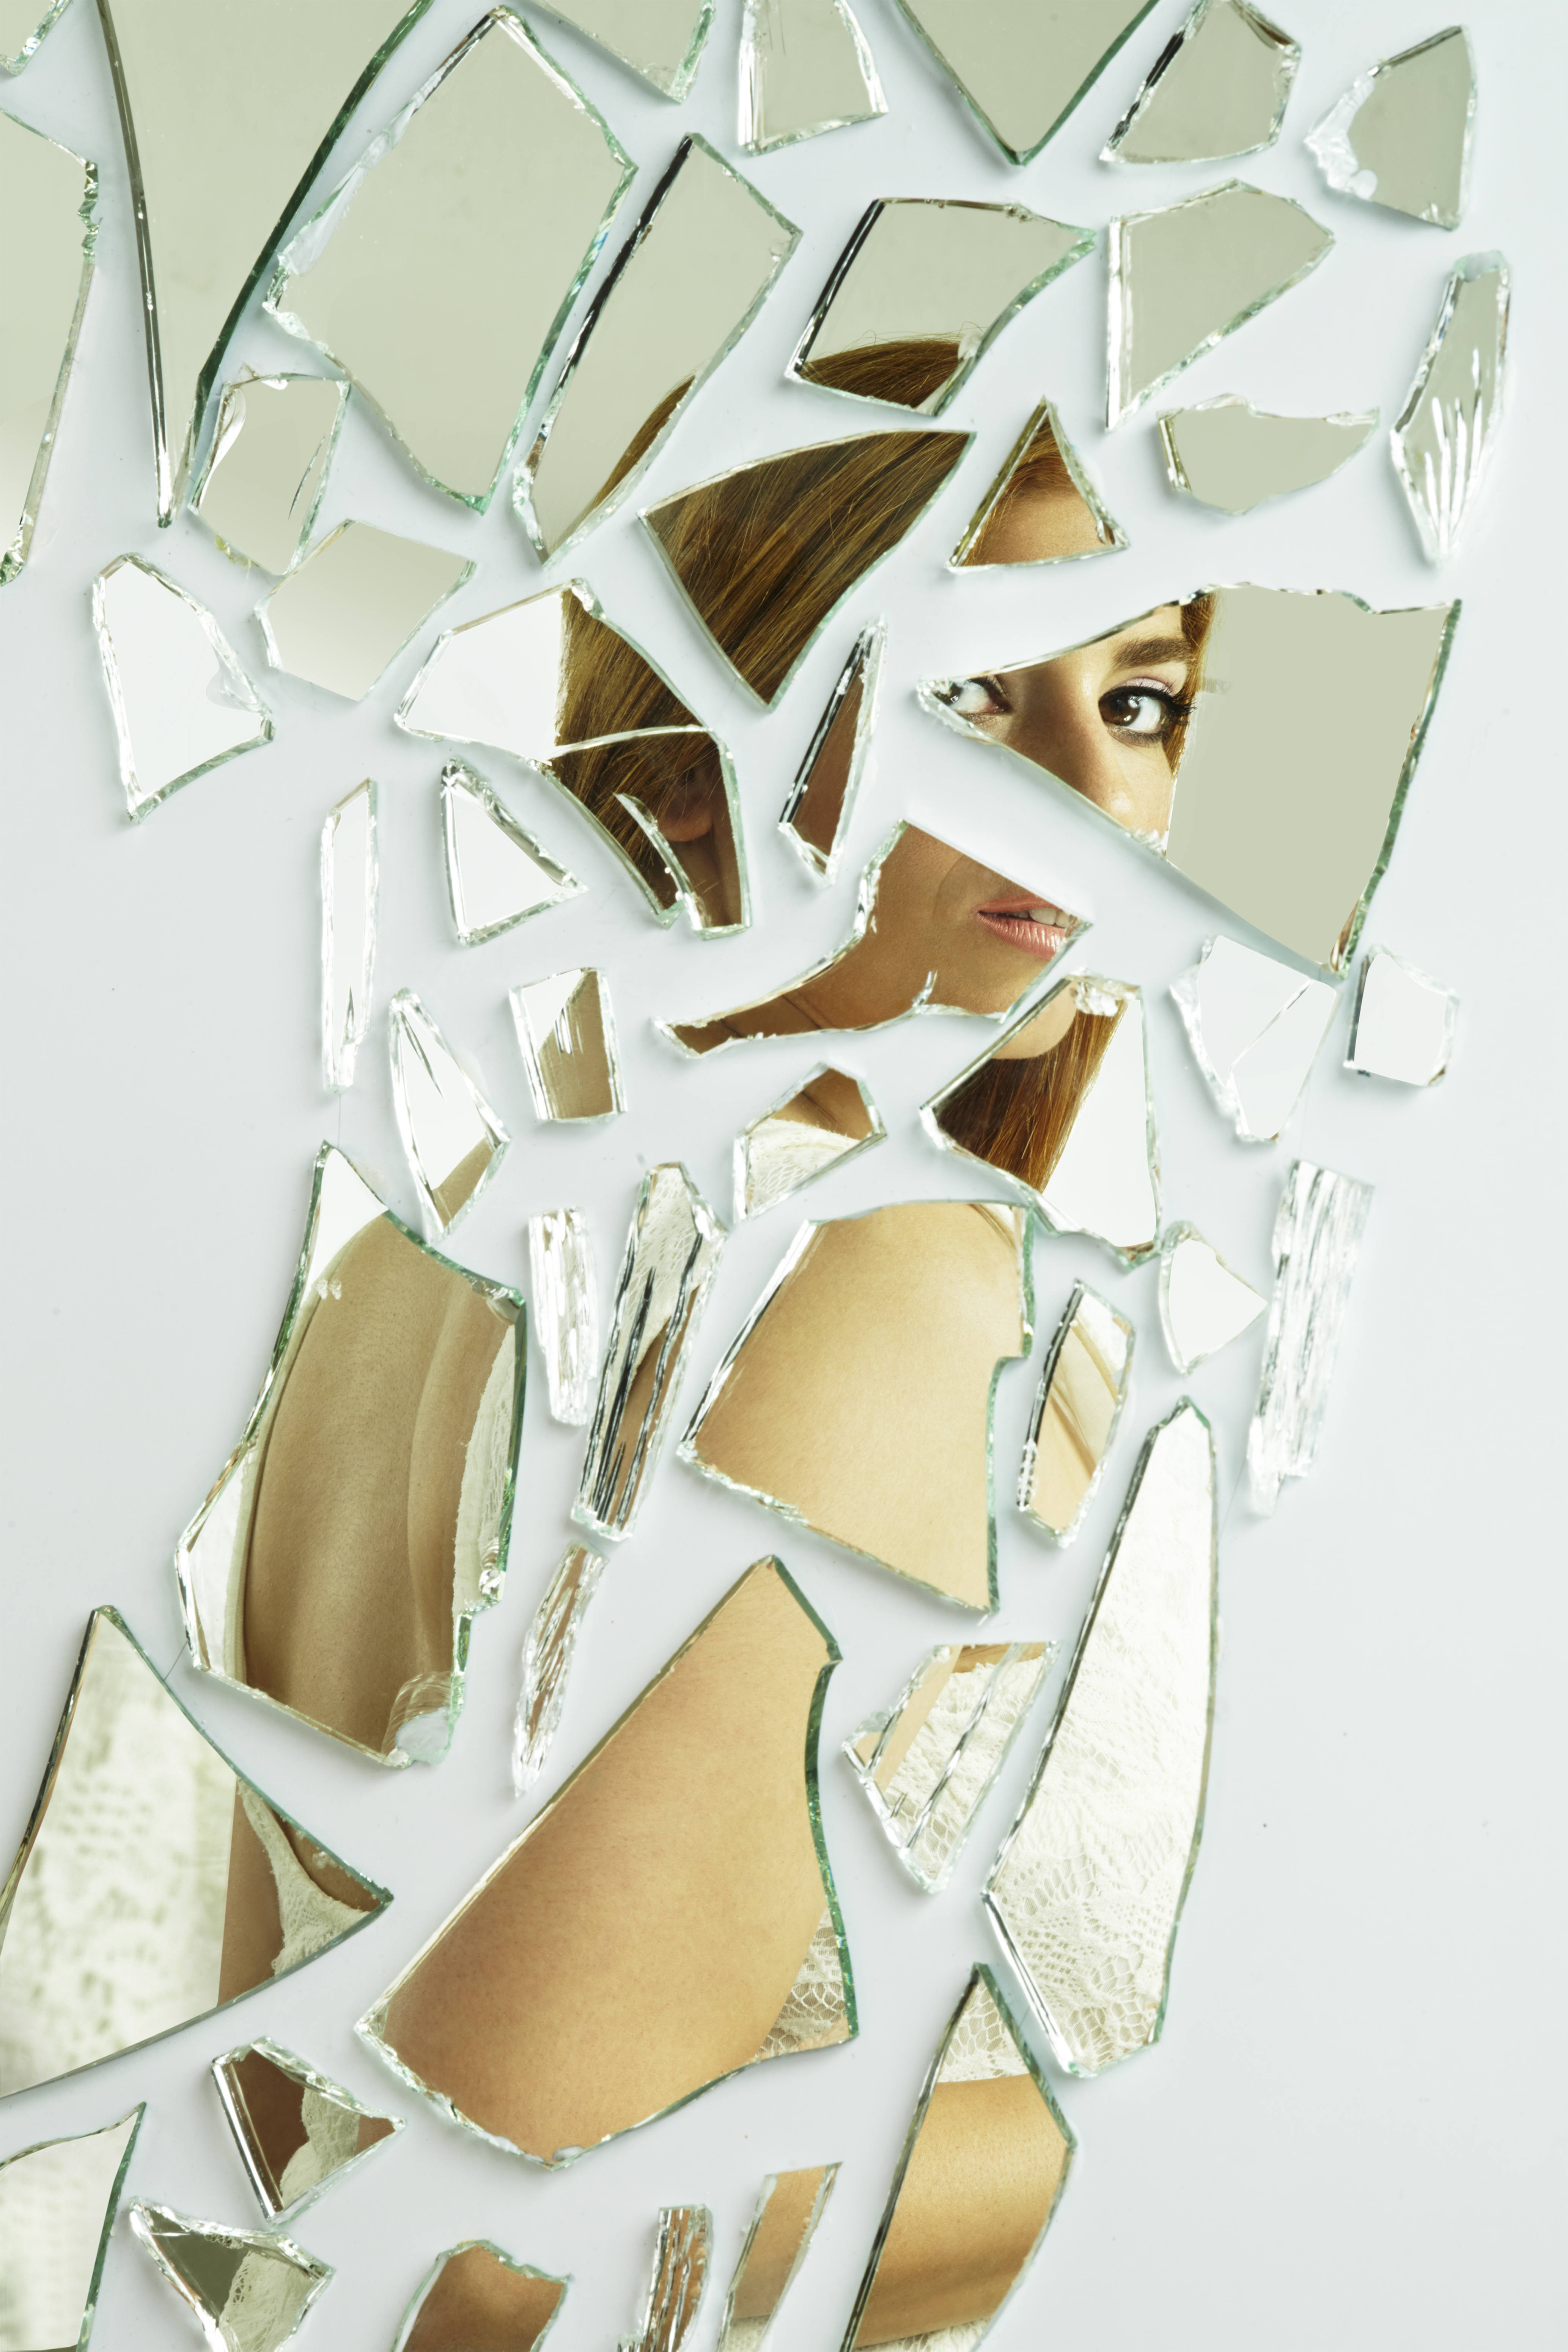 Woman-Upset-In-Mirror